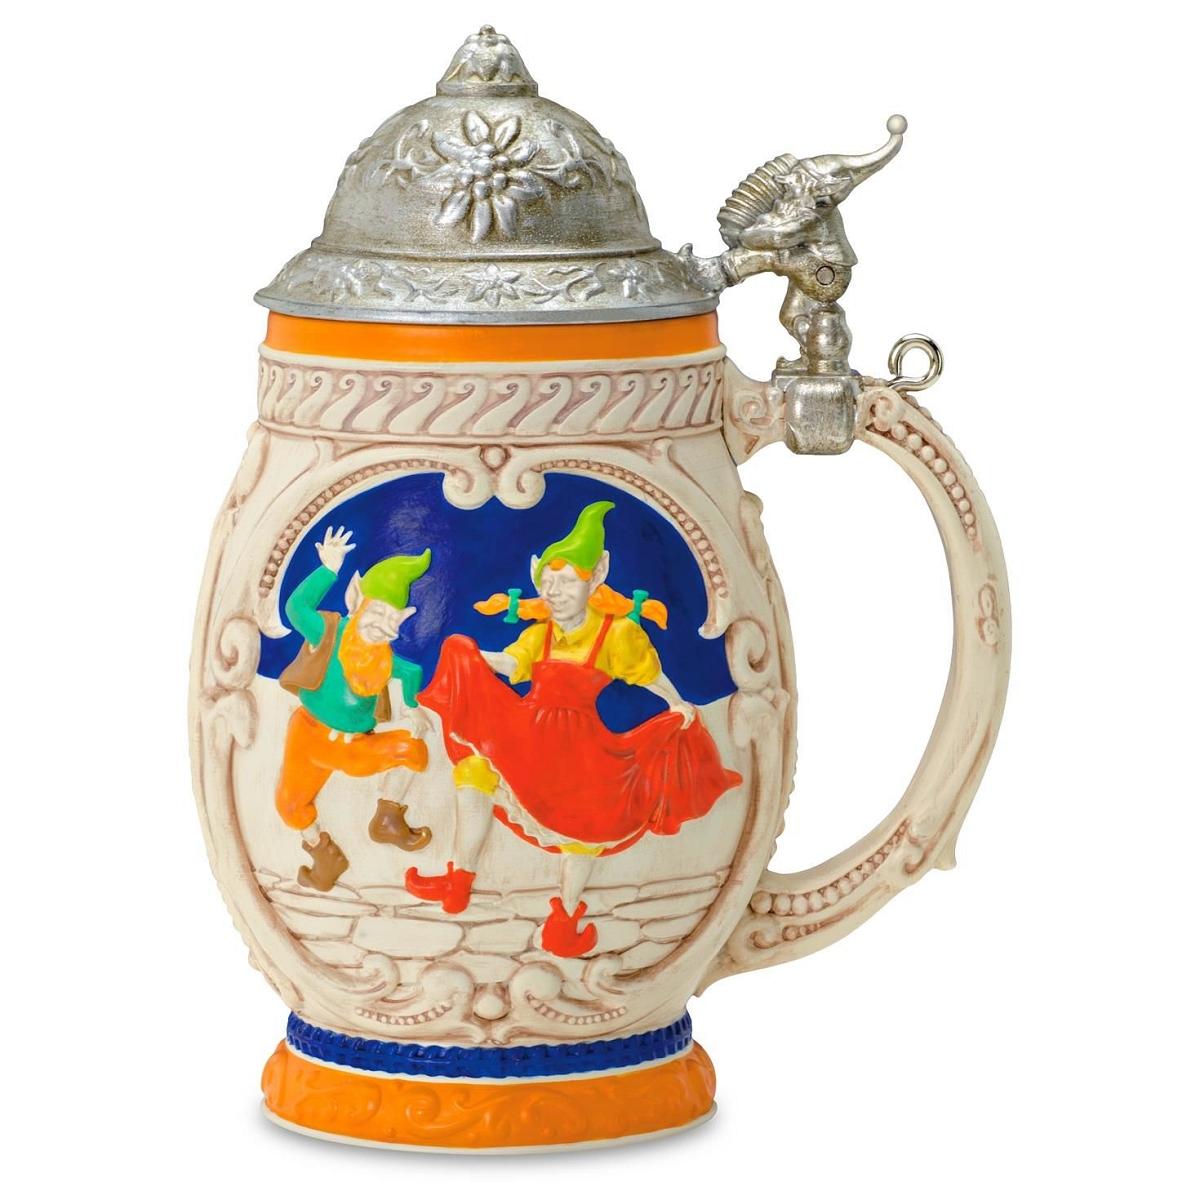 2016 It's a Lamp Hallmark Keepsake Ornament - Hooked on ...